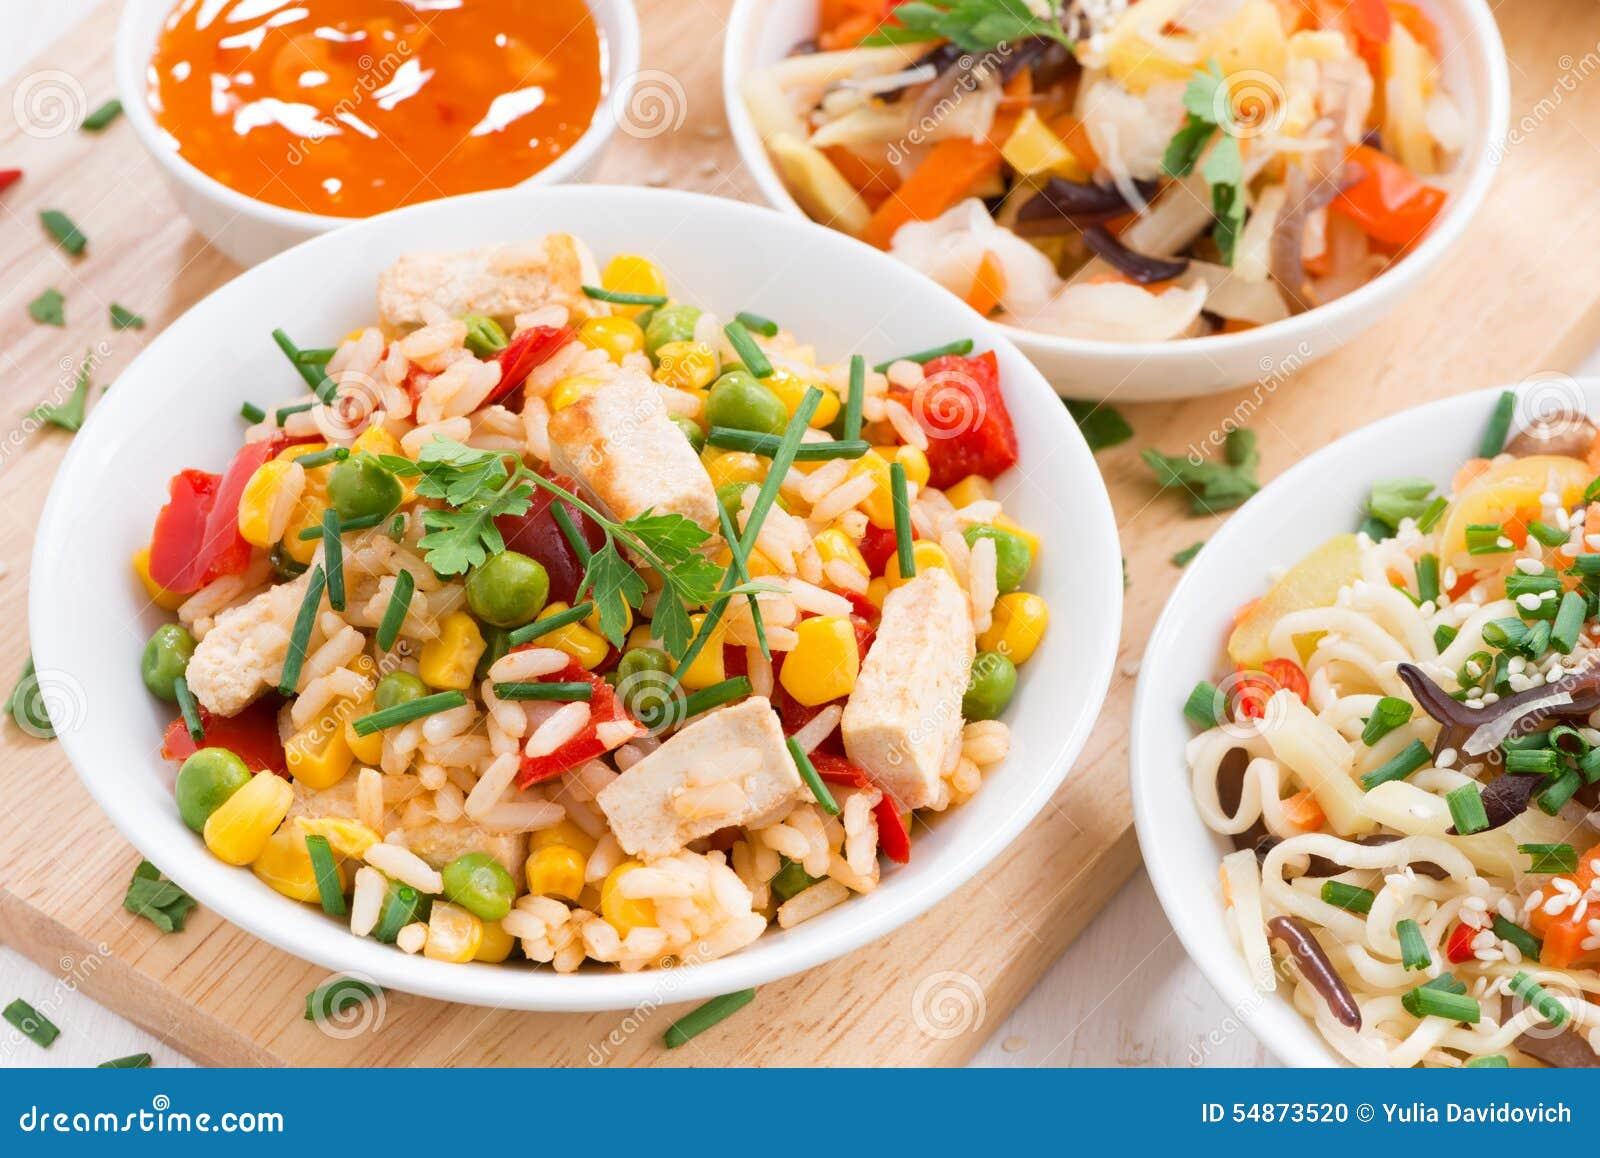 Asiatisk lunch - stekt ris med tofuen, nudlar med grönsaker